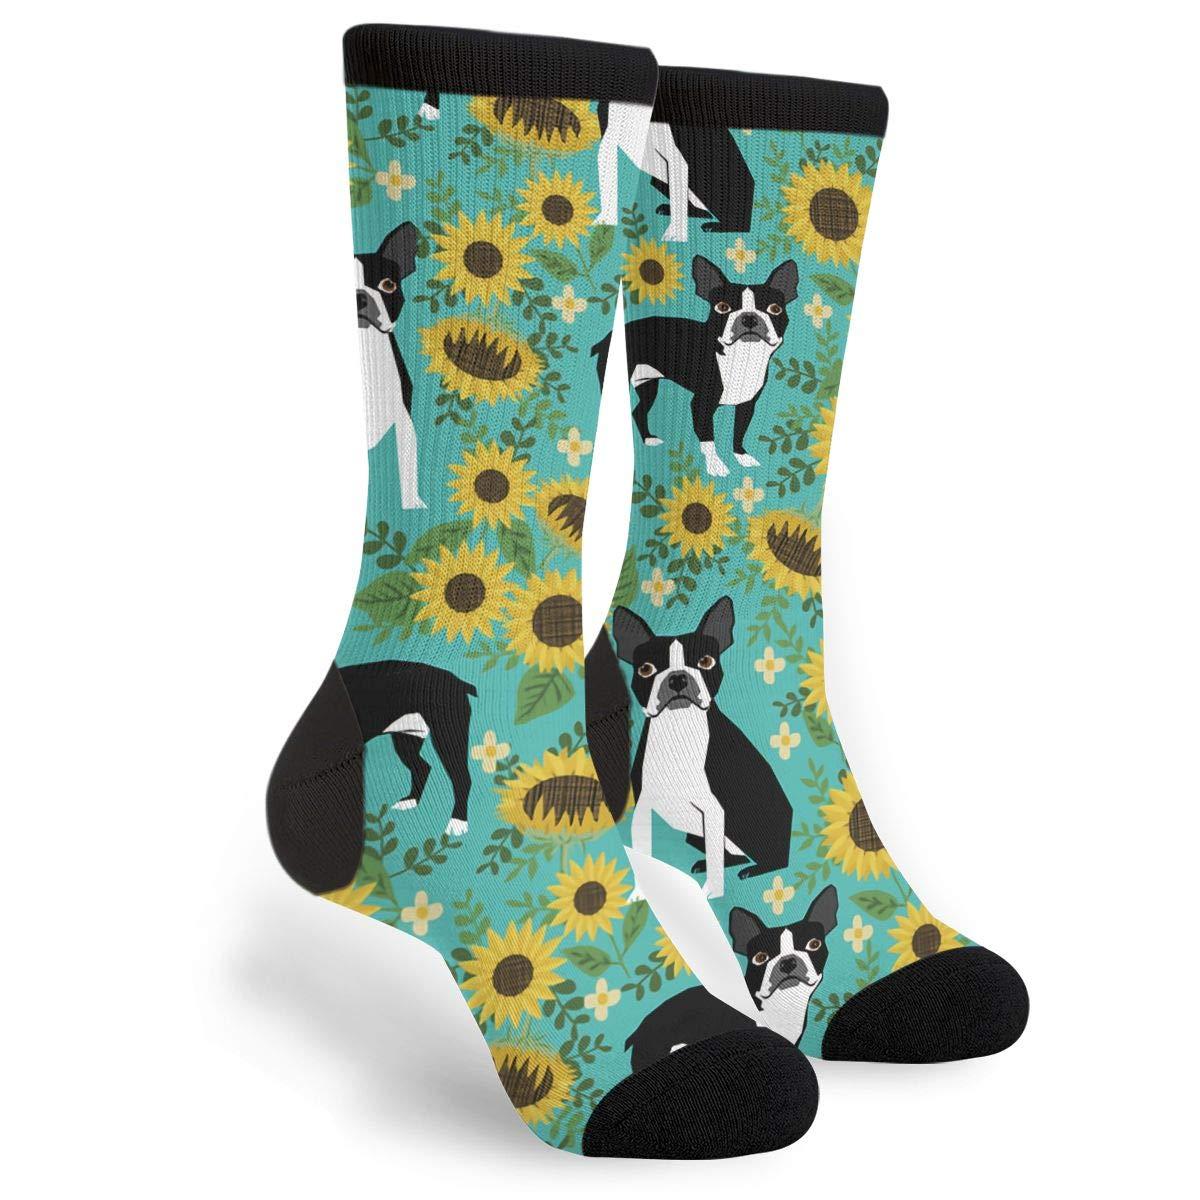 Boston Terrier Sunflower Dogs Socks,Christmas Gifts Unisex Casual Cotton Crazy Crew Socks